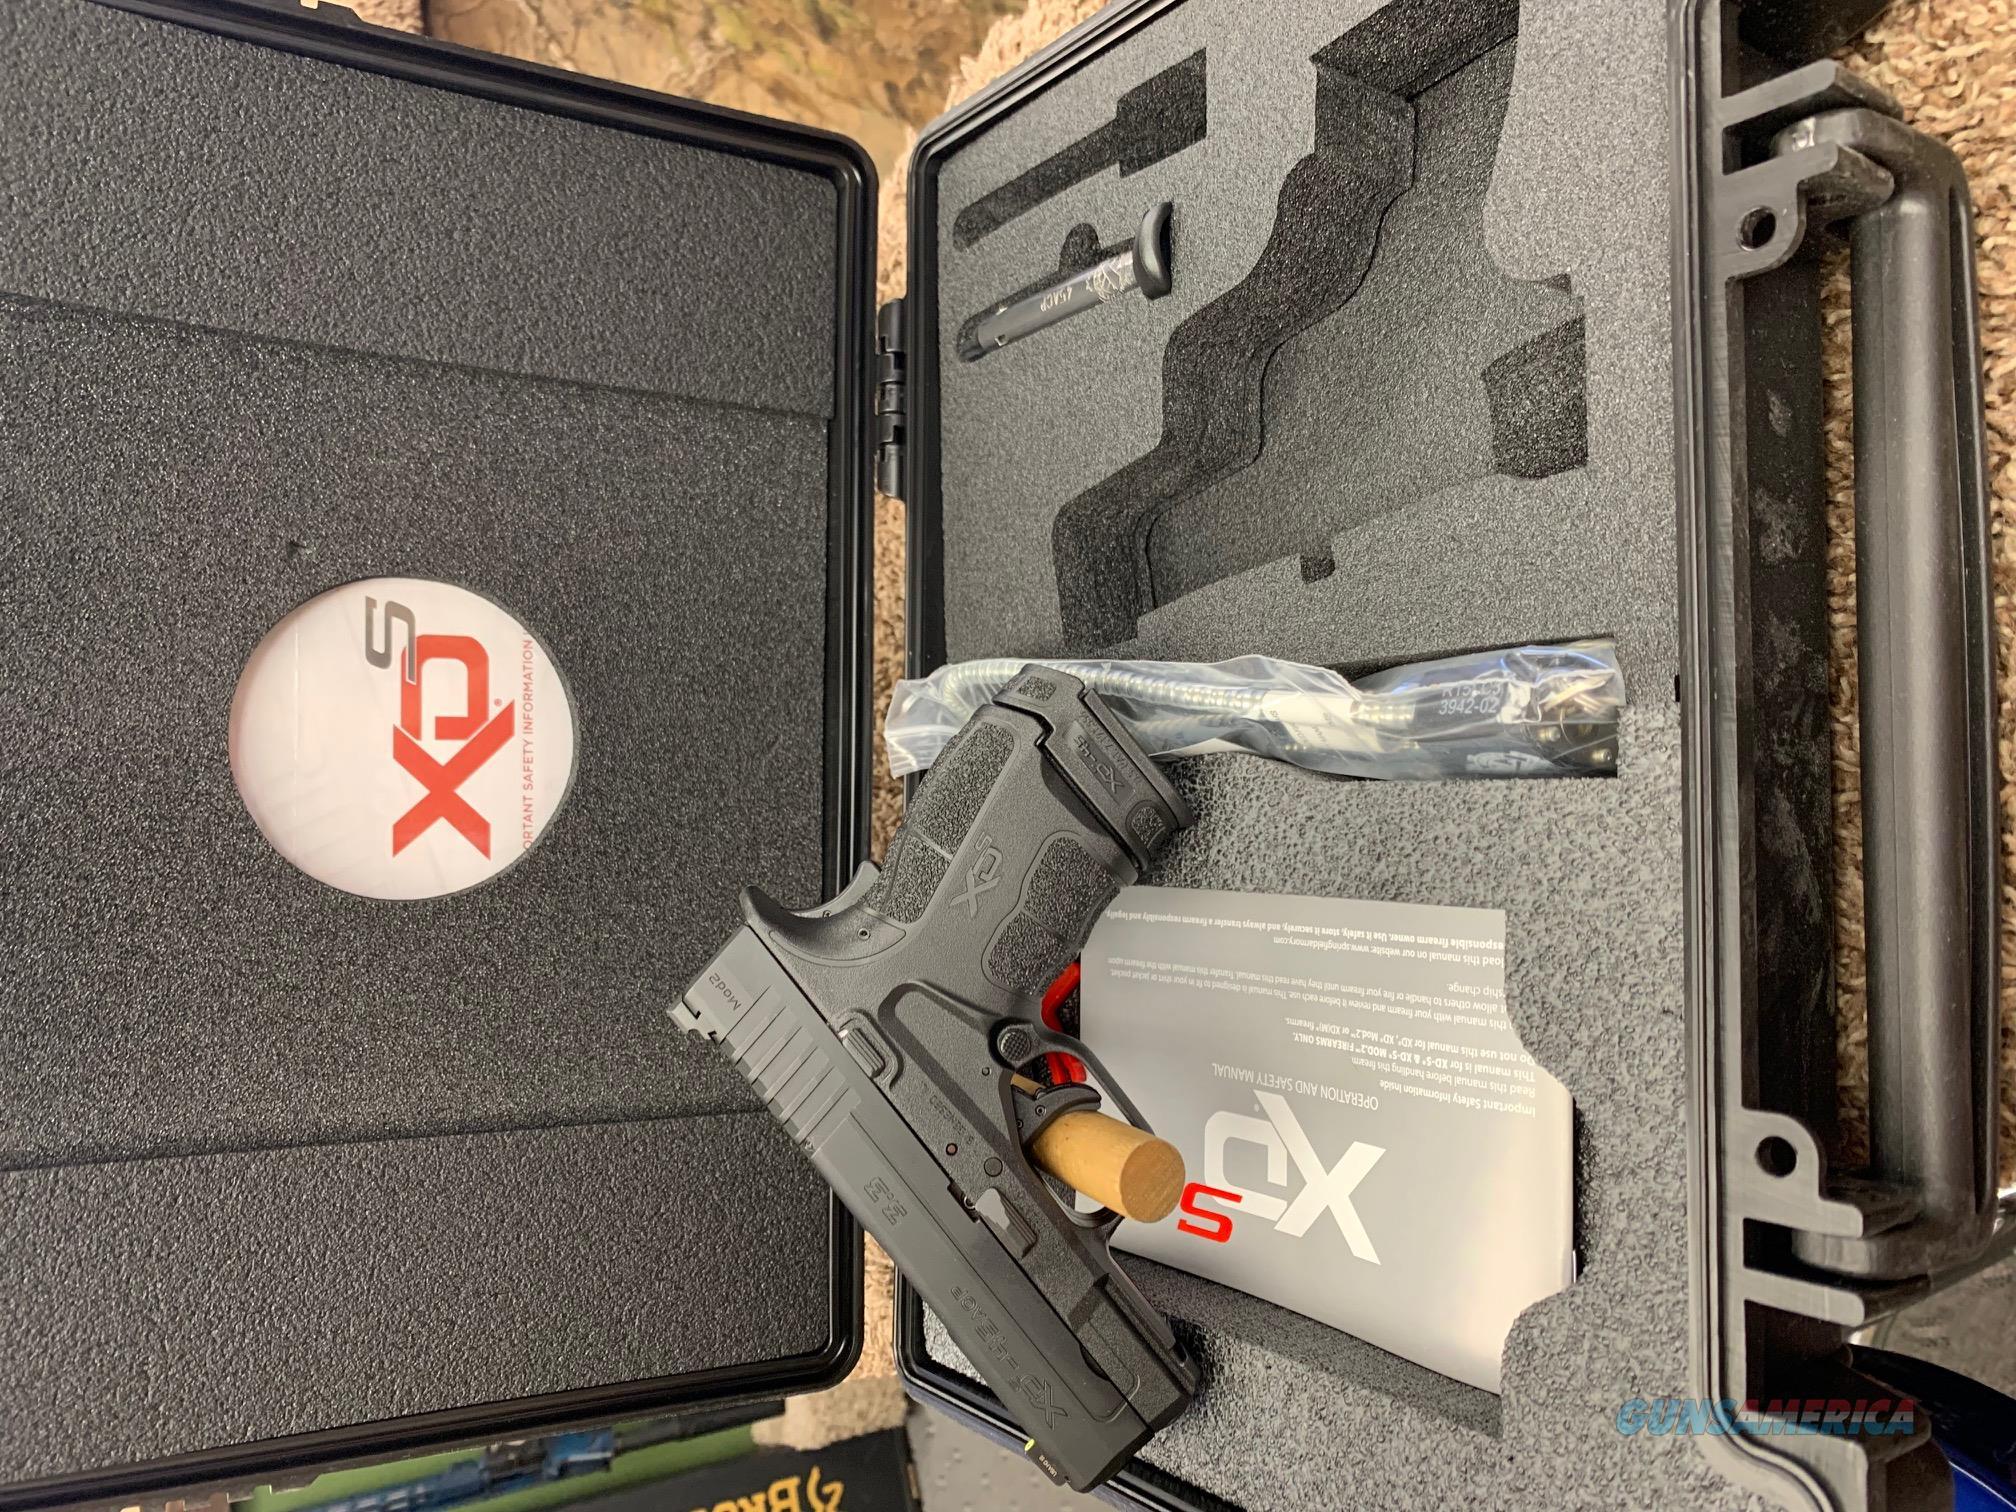 XDSG93345BT Springfield Armory XDS Mod 2 Night Sights 45 ACP  Guns > Pistols > Springfield Armory Pistols > XD-S